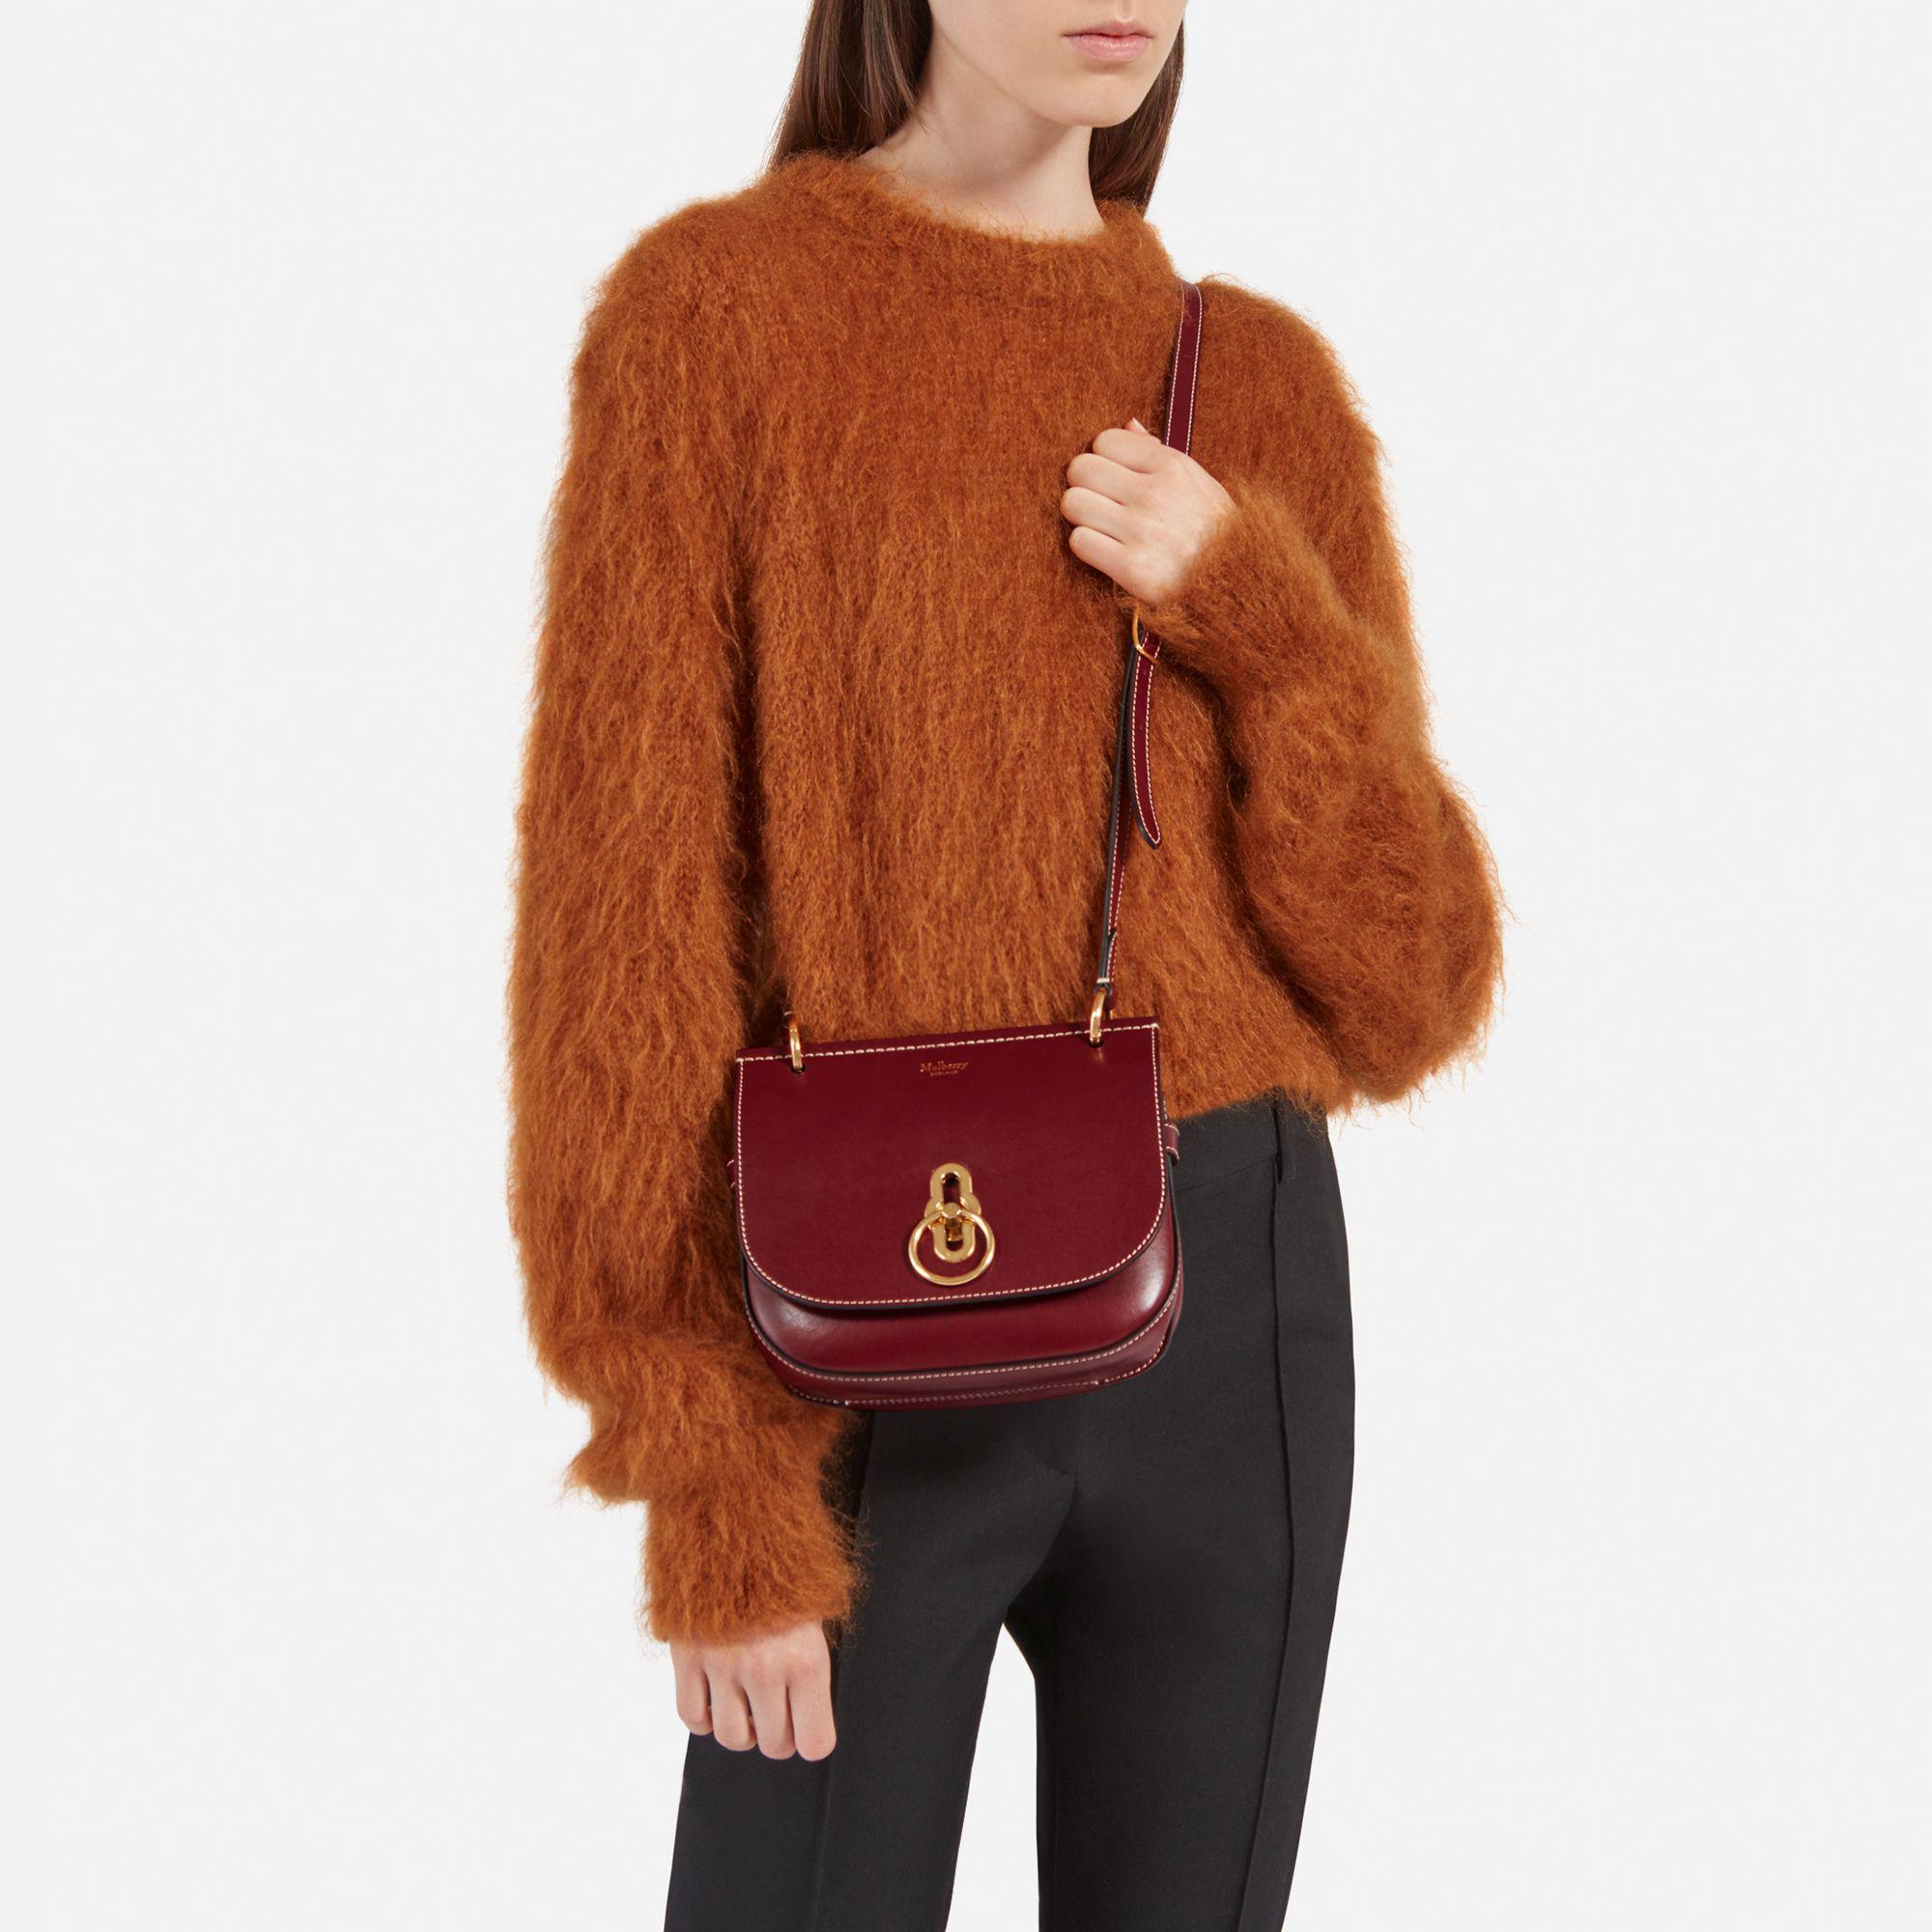 b018f3af63bc buy lyst mulberry small amberley satchel in black 33a57 817fb